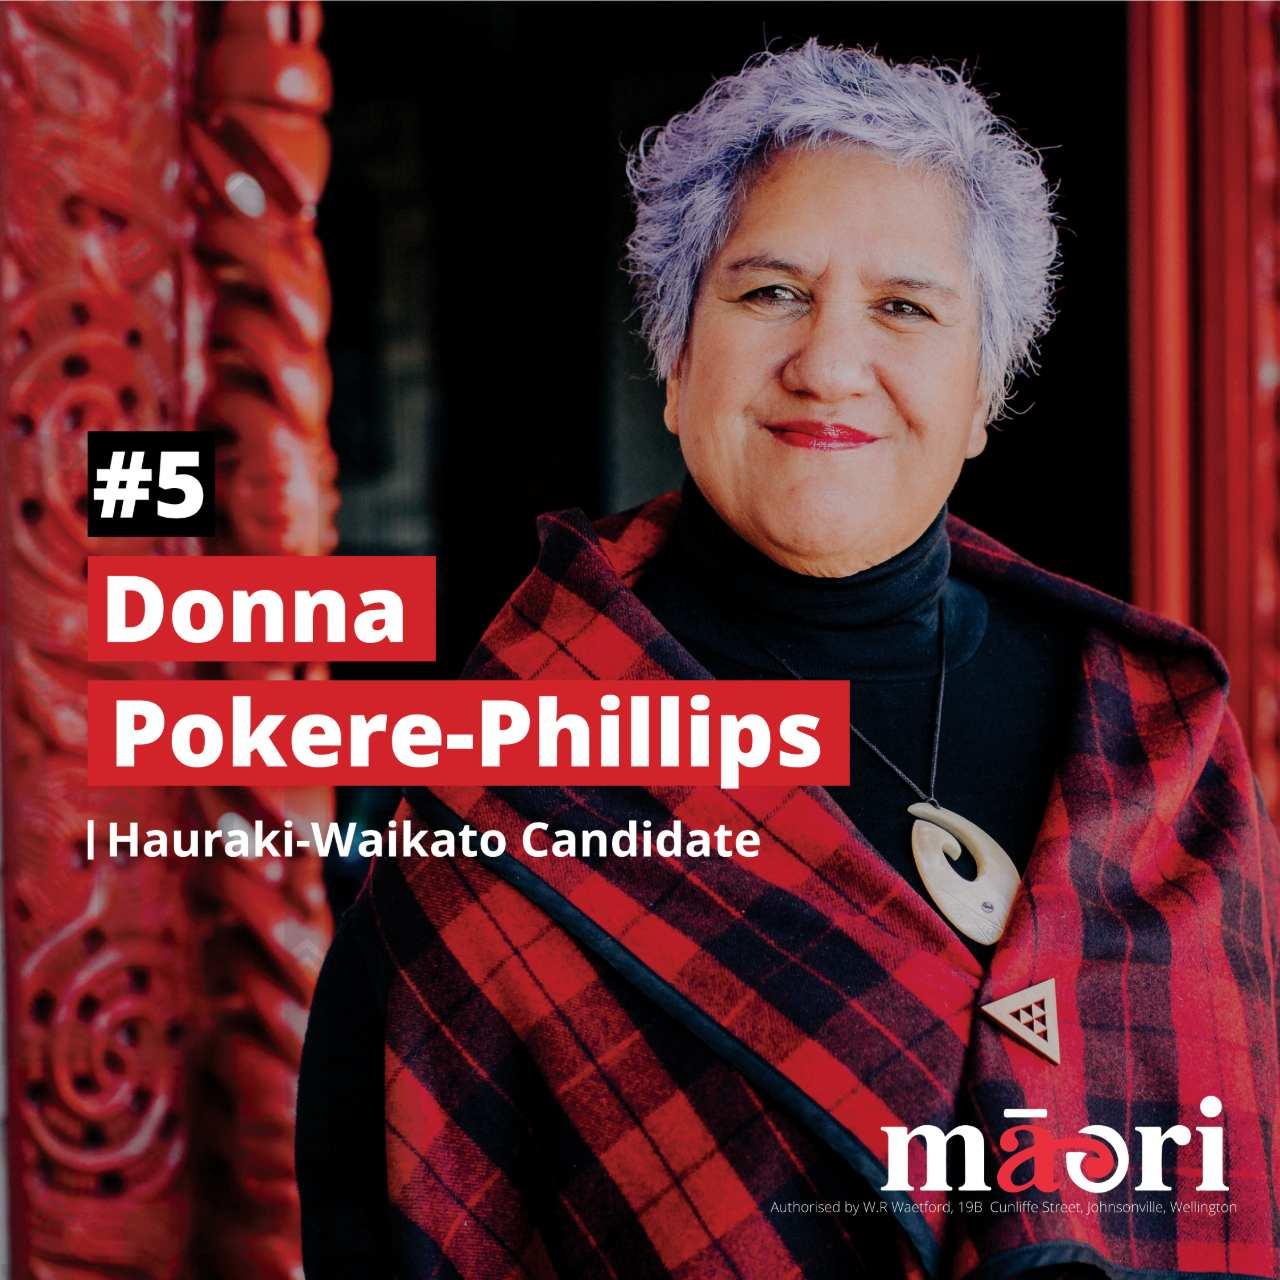 Donna Pokere-Phillips, Hauraki-Waikato Candidate